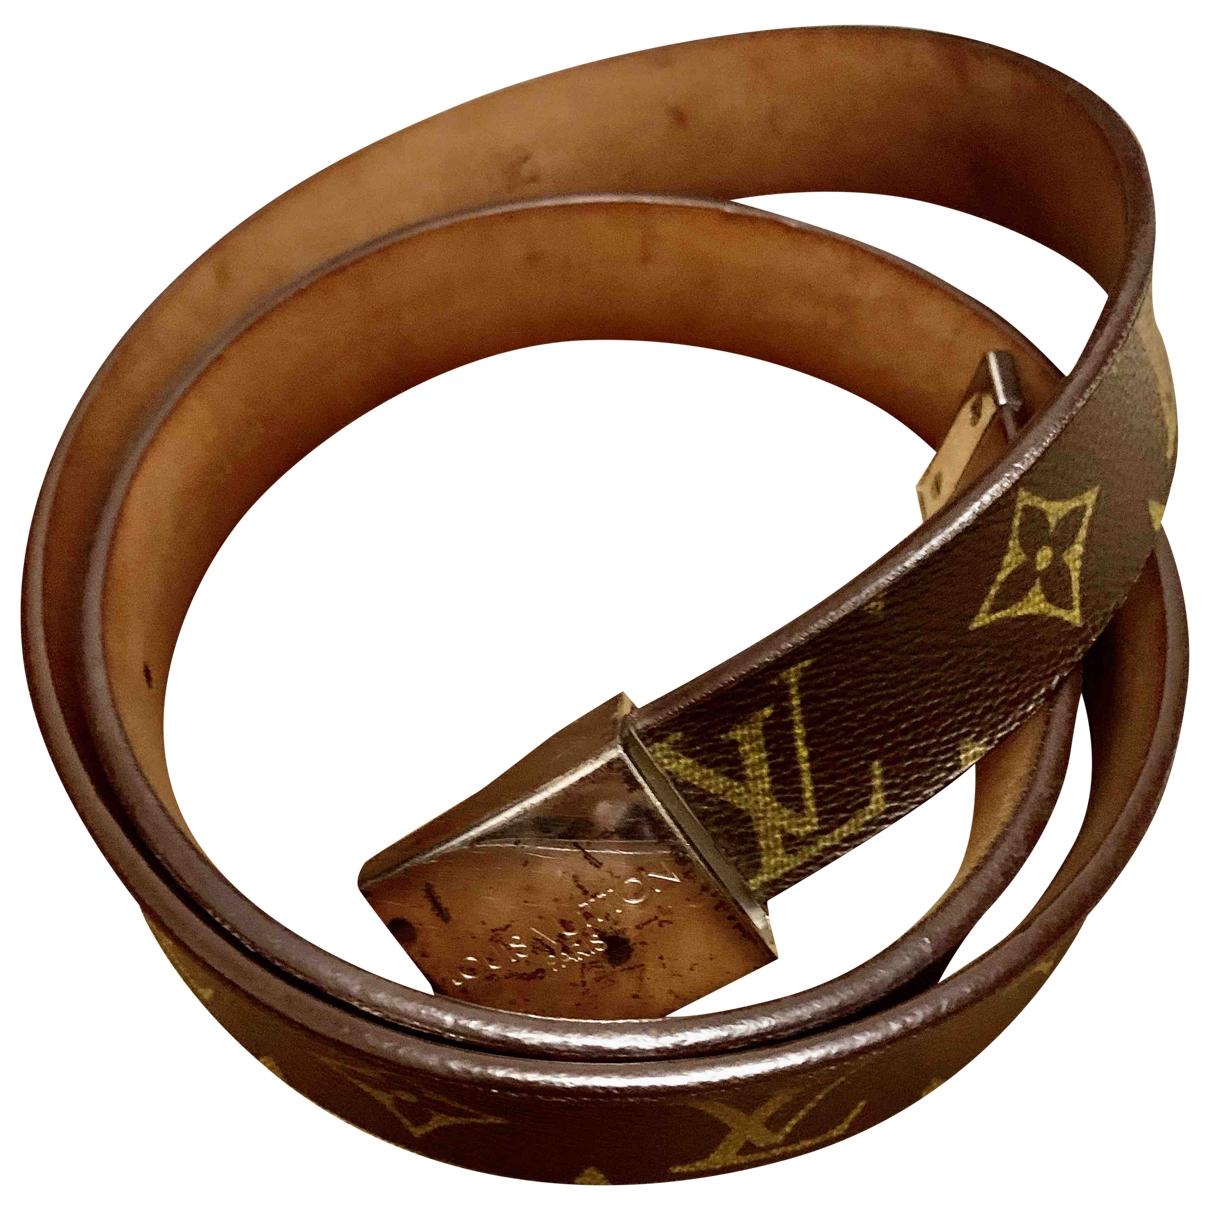 Louis Vuitton \N Brown Cloth belt for Women 80 cm